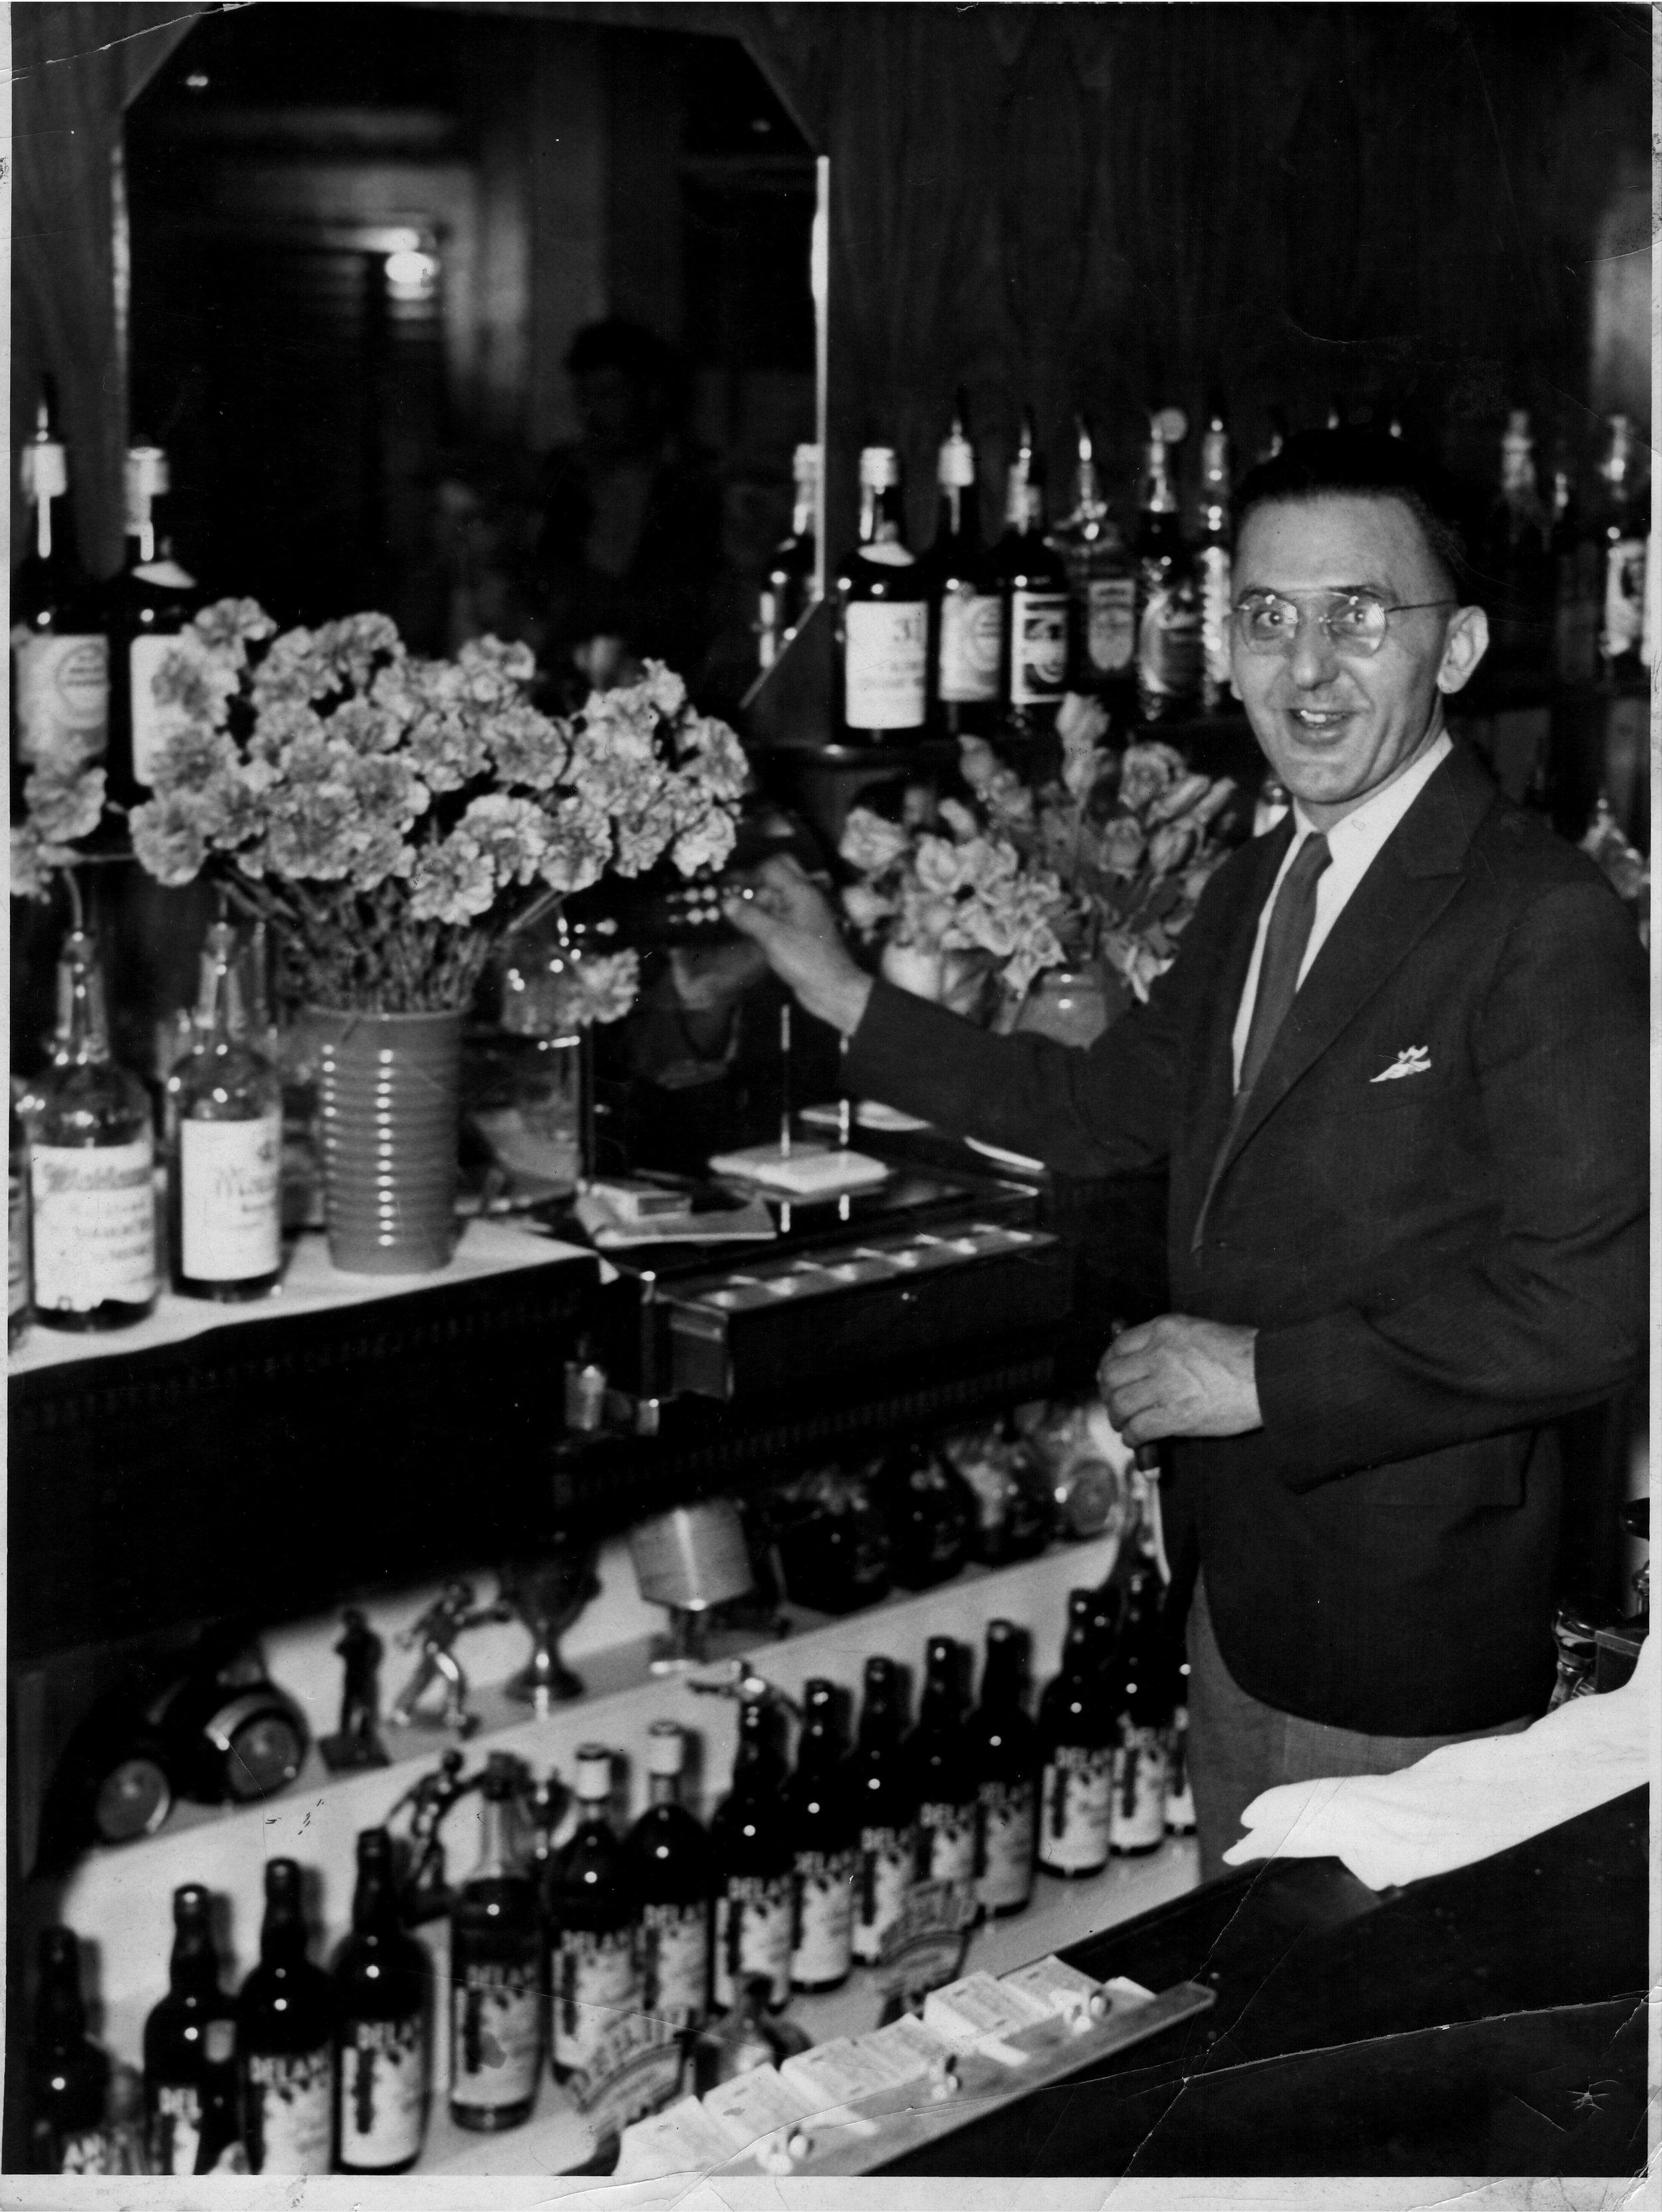 Henry-Gunselman-behind-the-bar.jpg